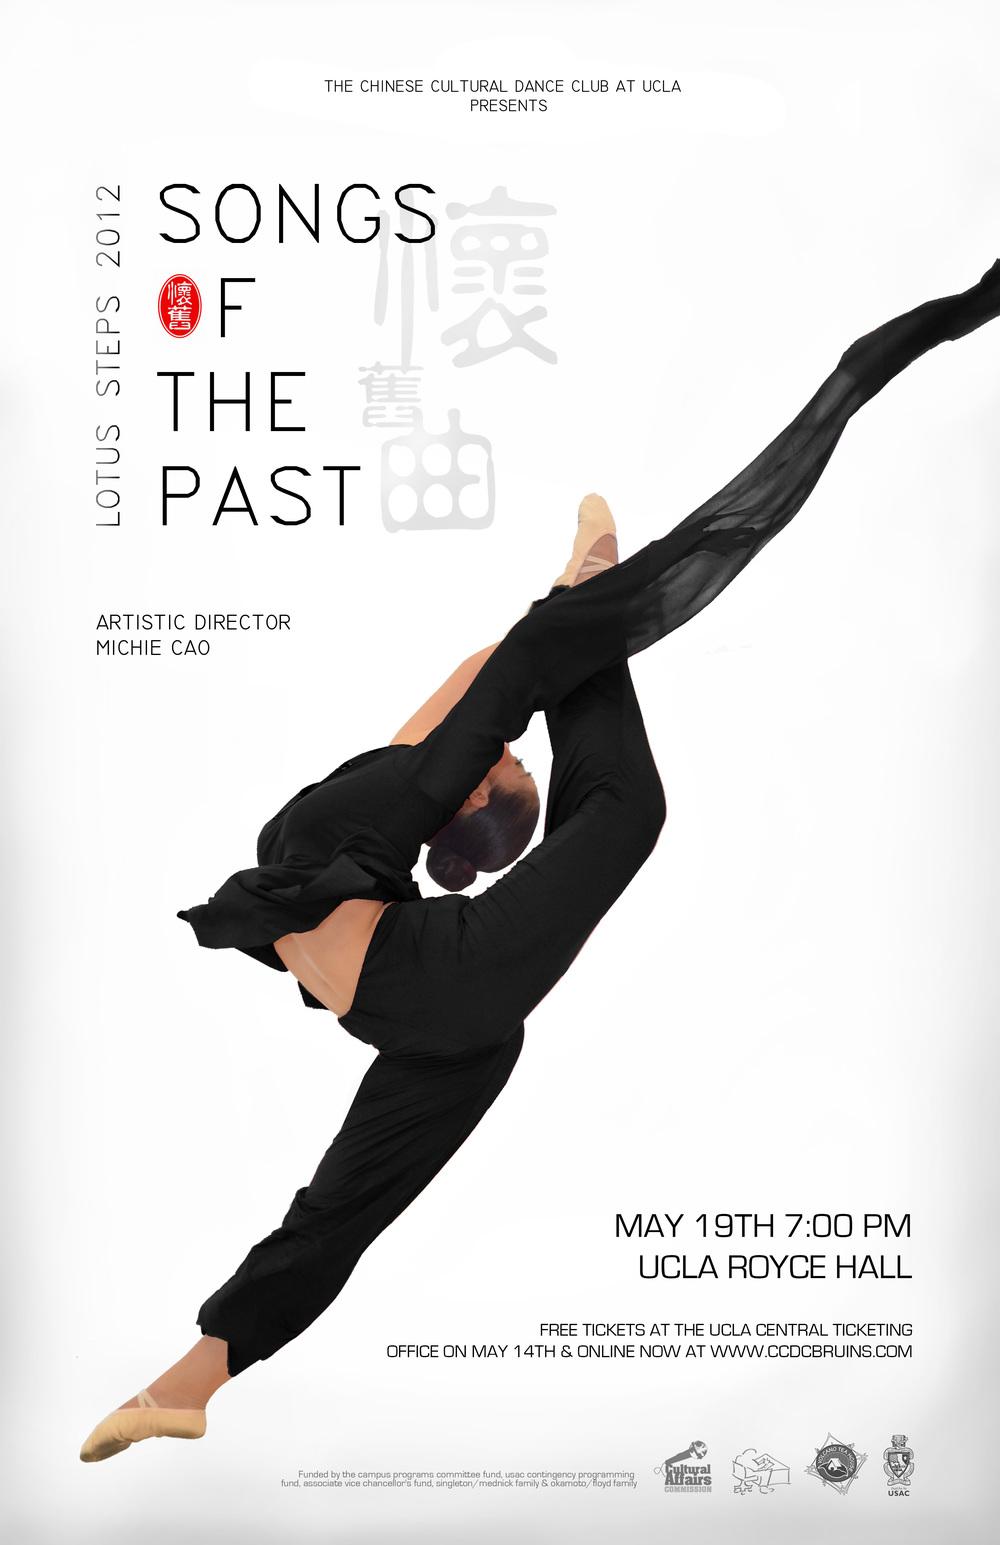 CCDC Lotus Steps 2012 Poster_v1_FINAL_L.jpg